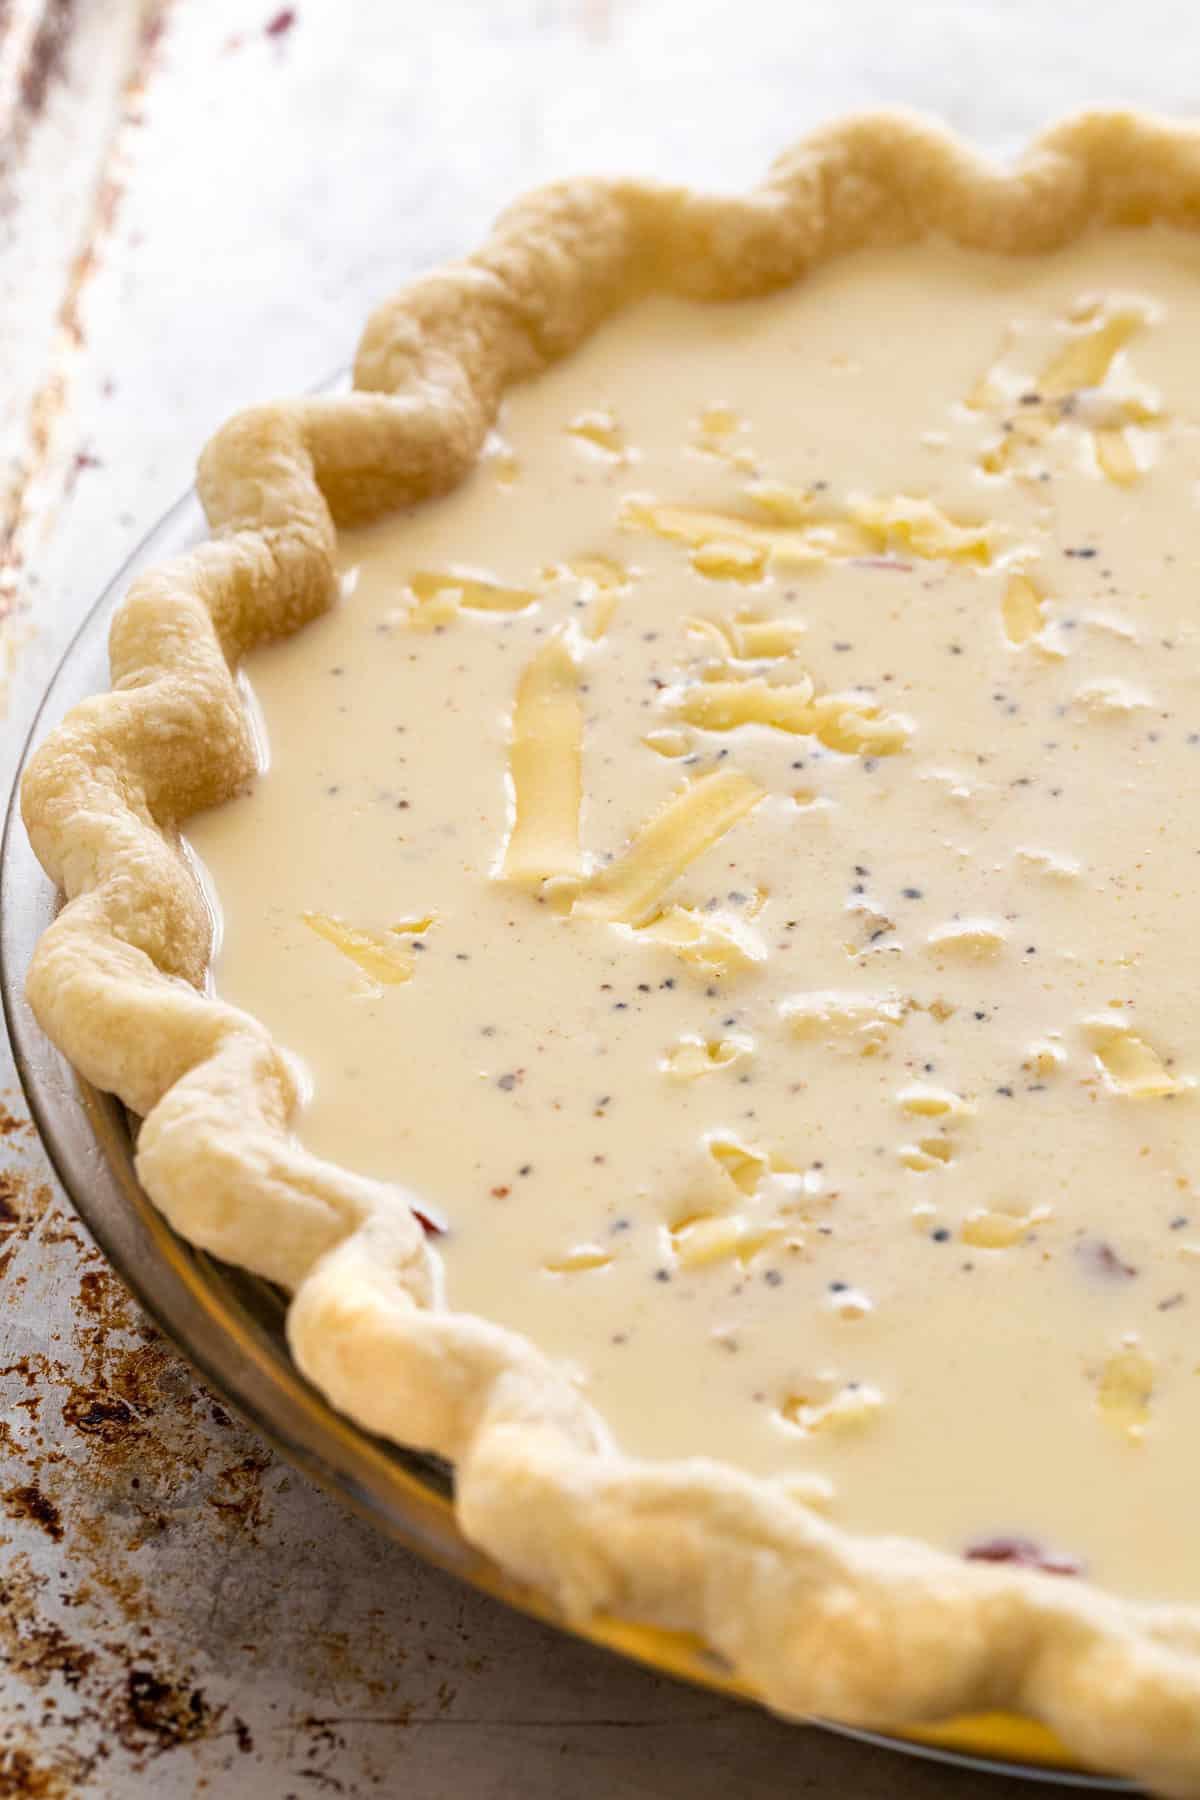 liquid filling inside a pie crust